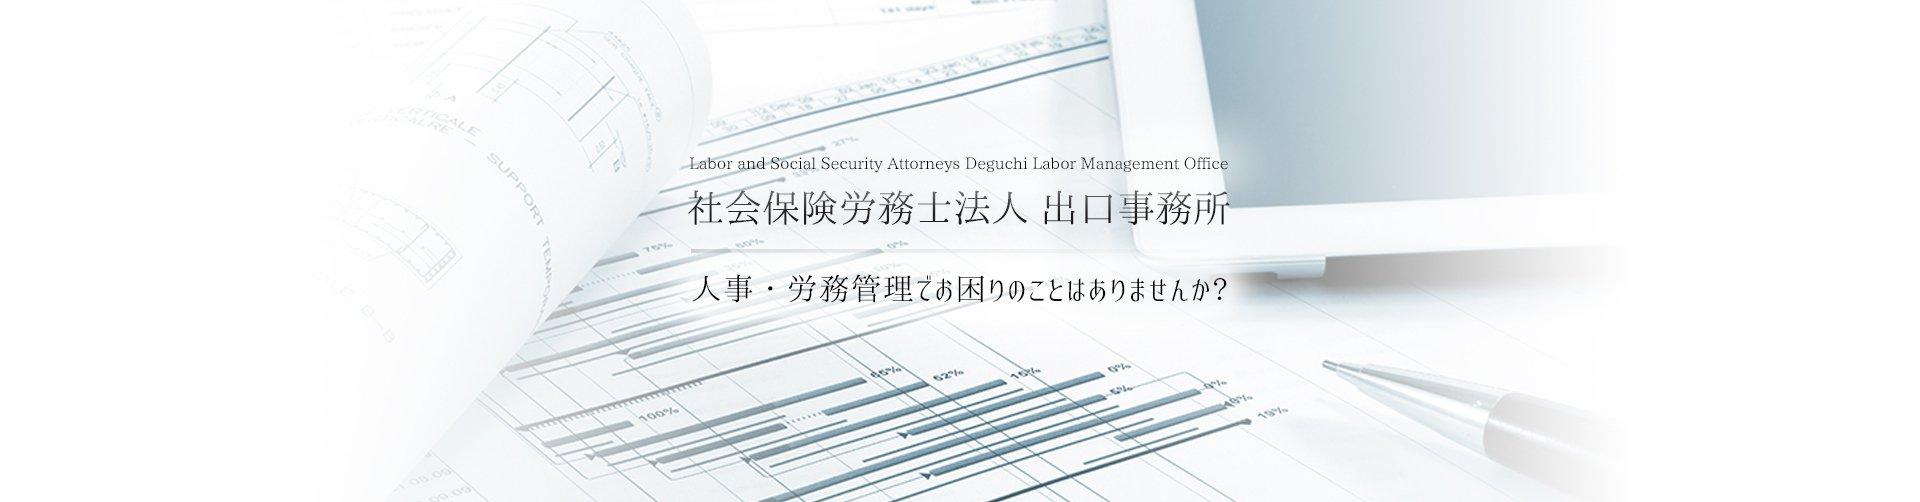 deguchi_top1_1028.jpg